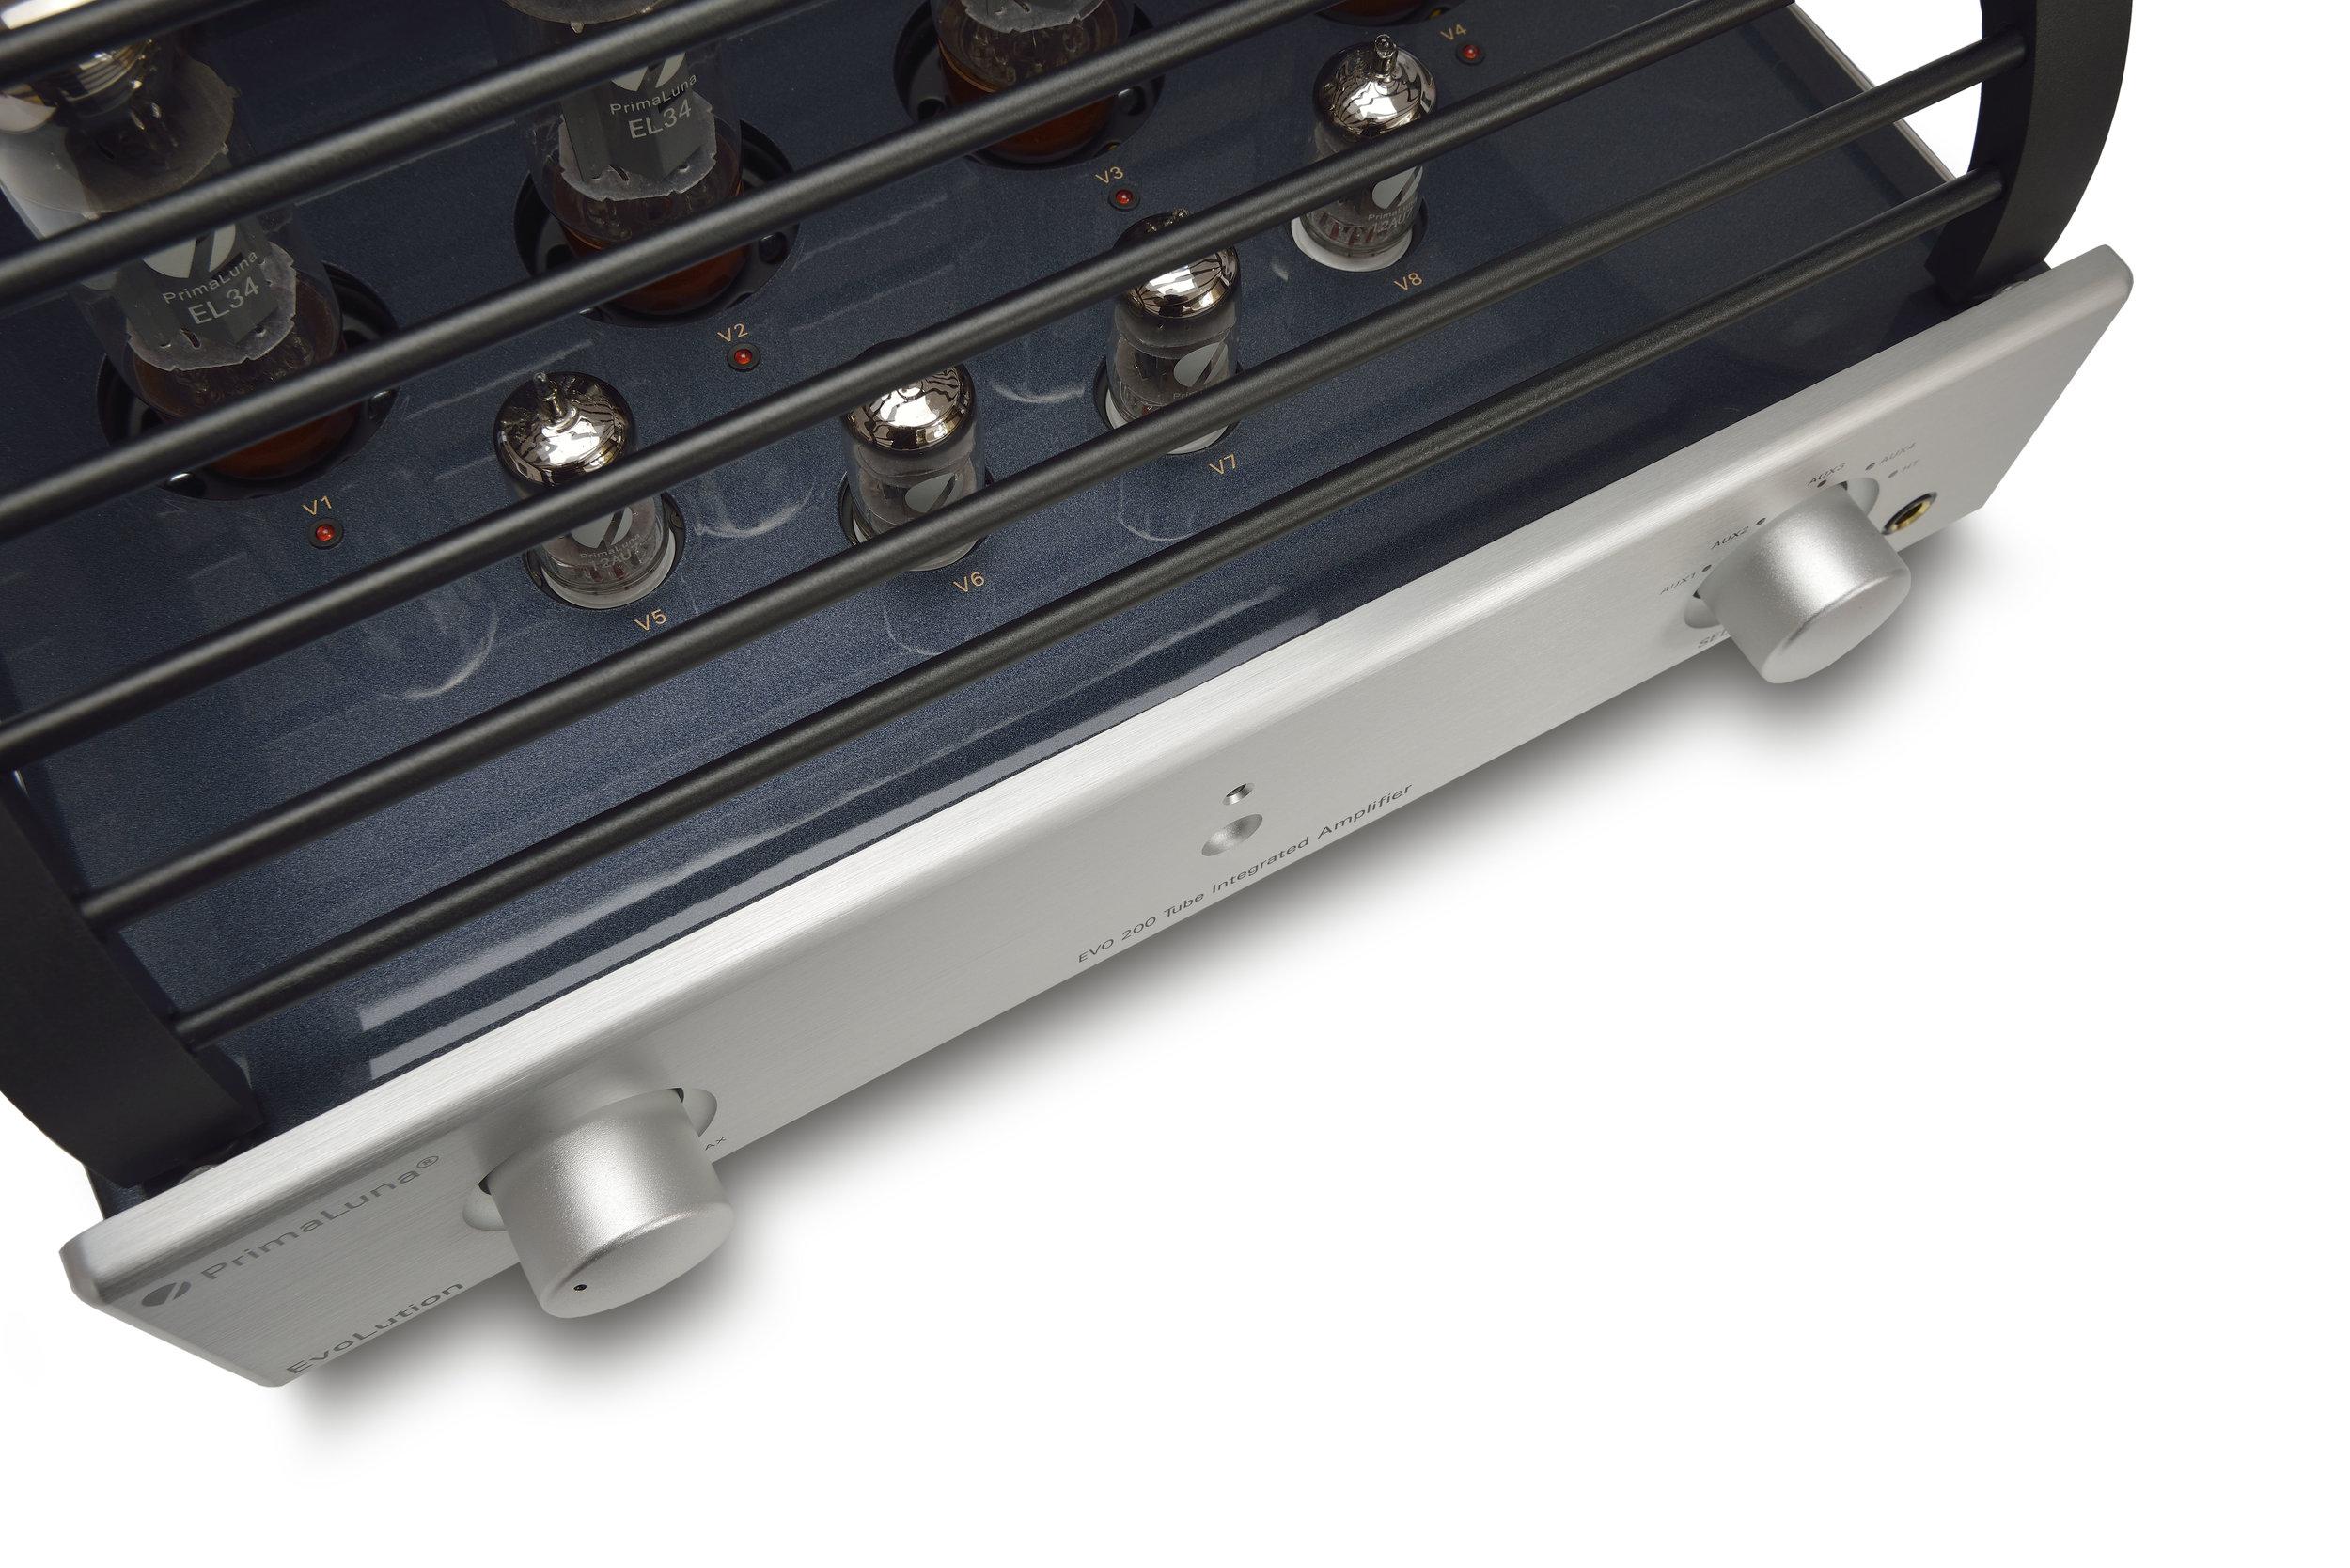 110b - PrimaLuna Evo 200 Tube Integrated Amplifier - silver - artistic - white background.jpg